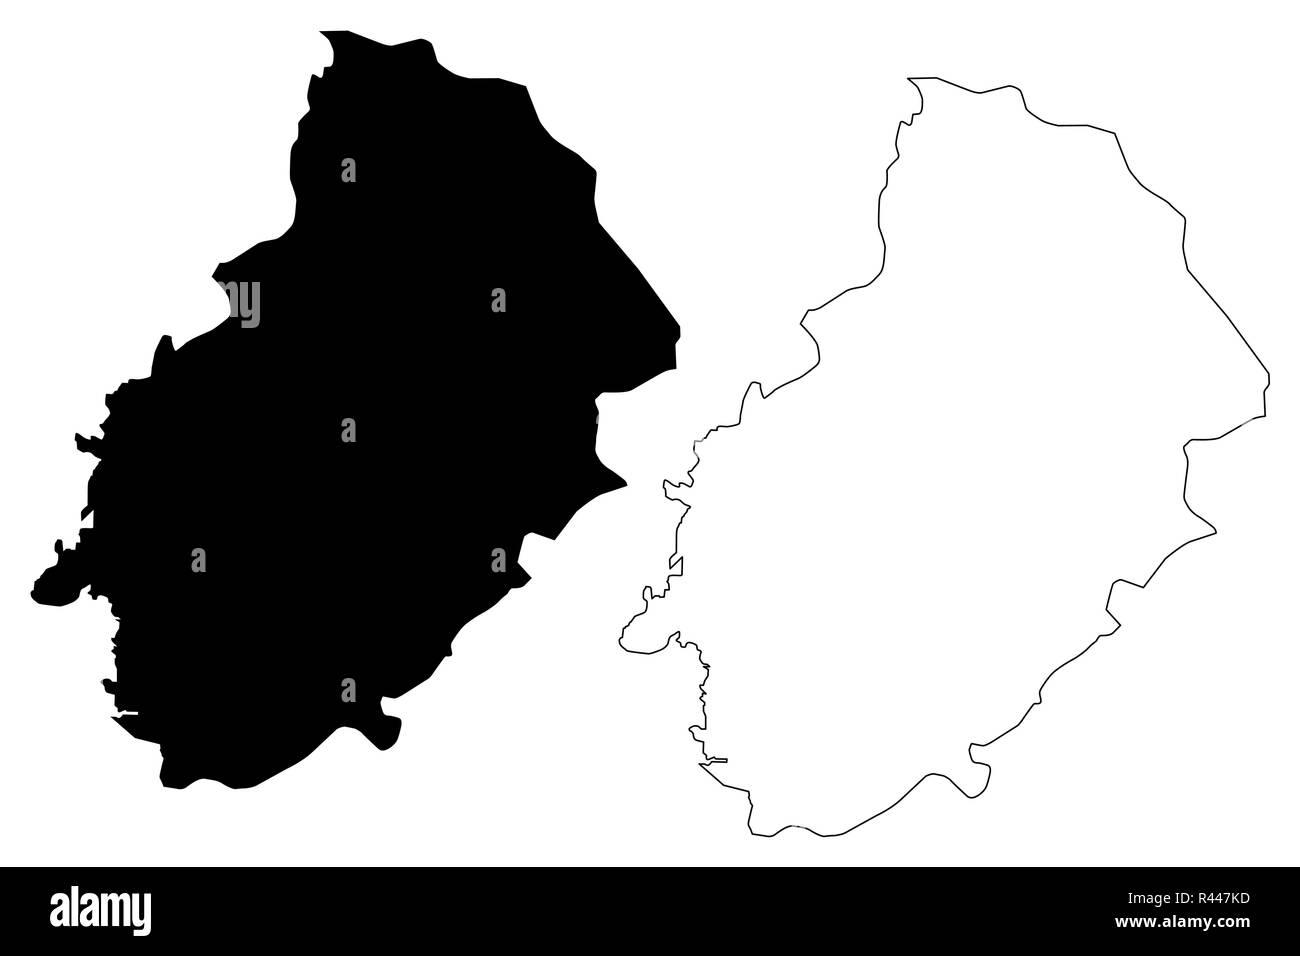 Kirikkale (Provinces of the Republic of Turkey) map vector illustration, scribble sketch Kirikkale ili map - Stock Image